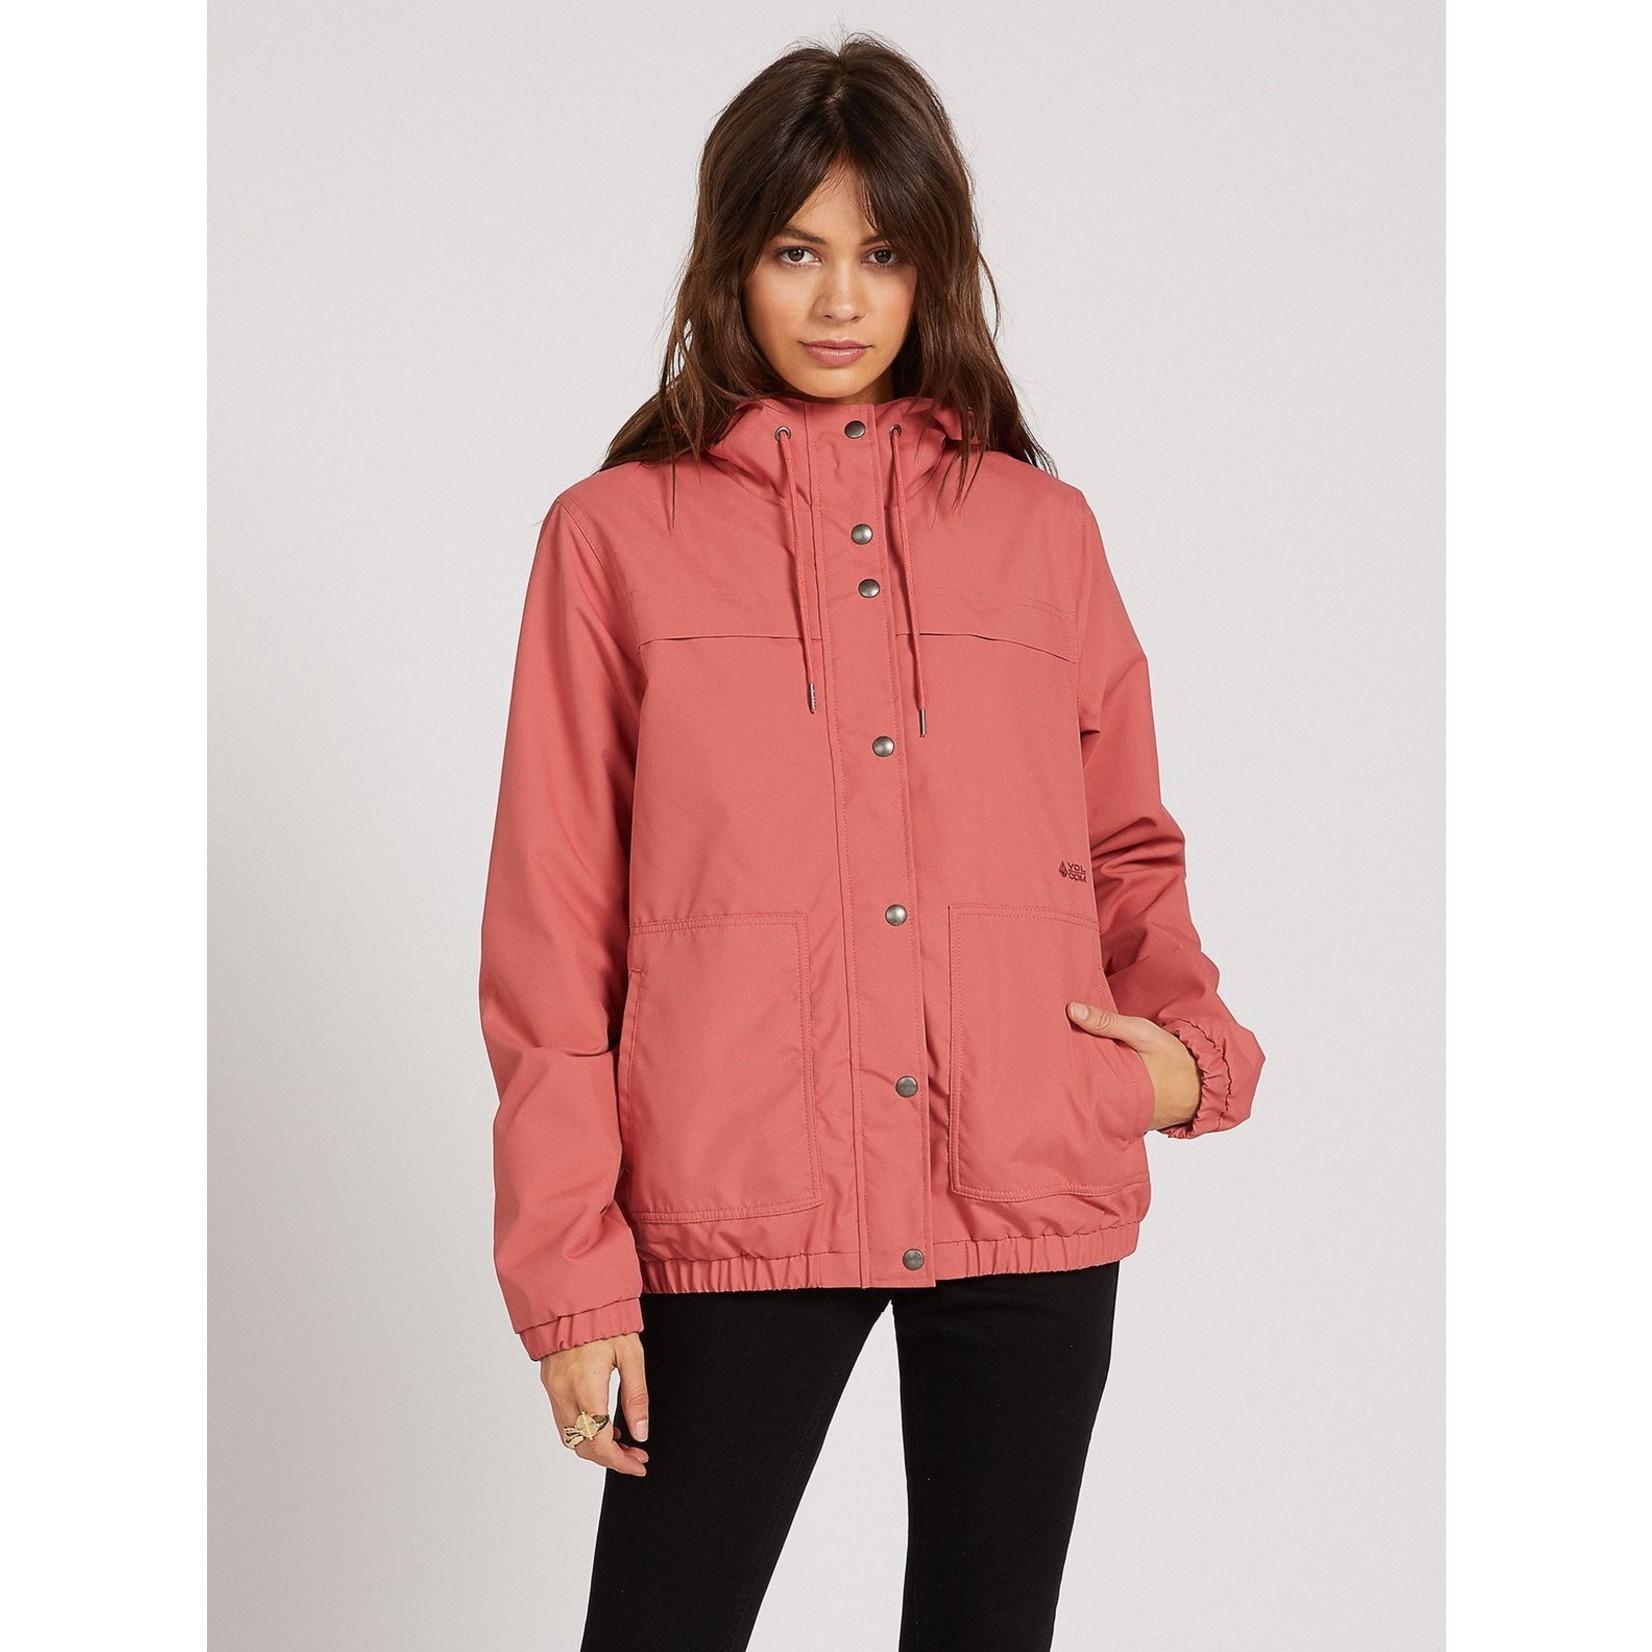 Volcom Emily Stone Jacket